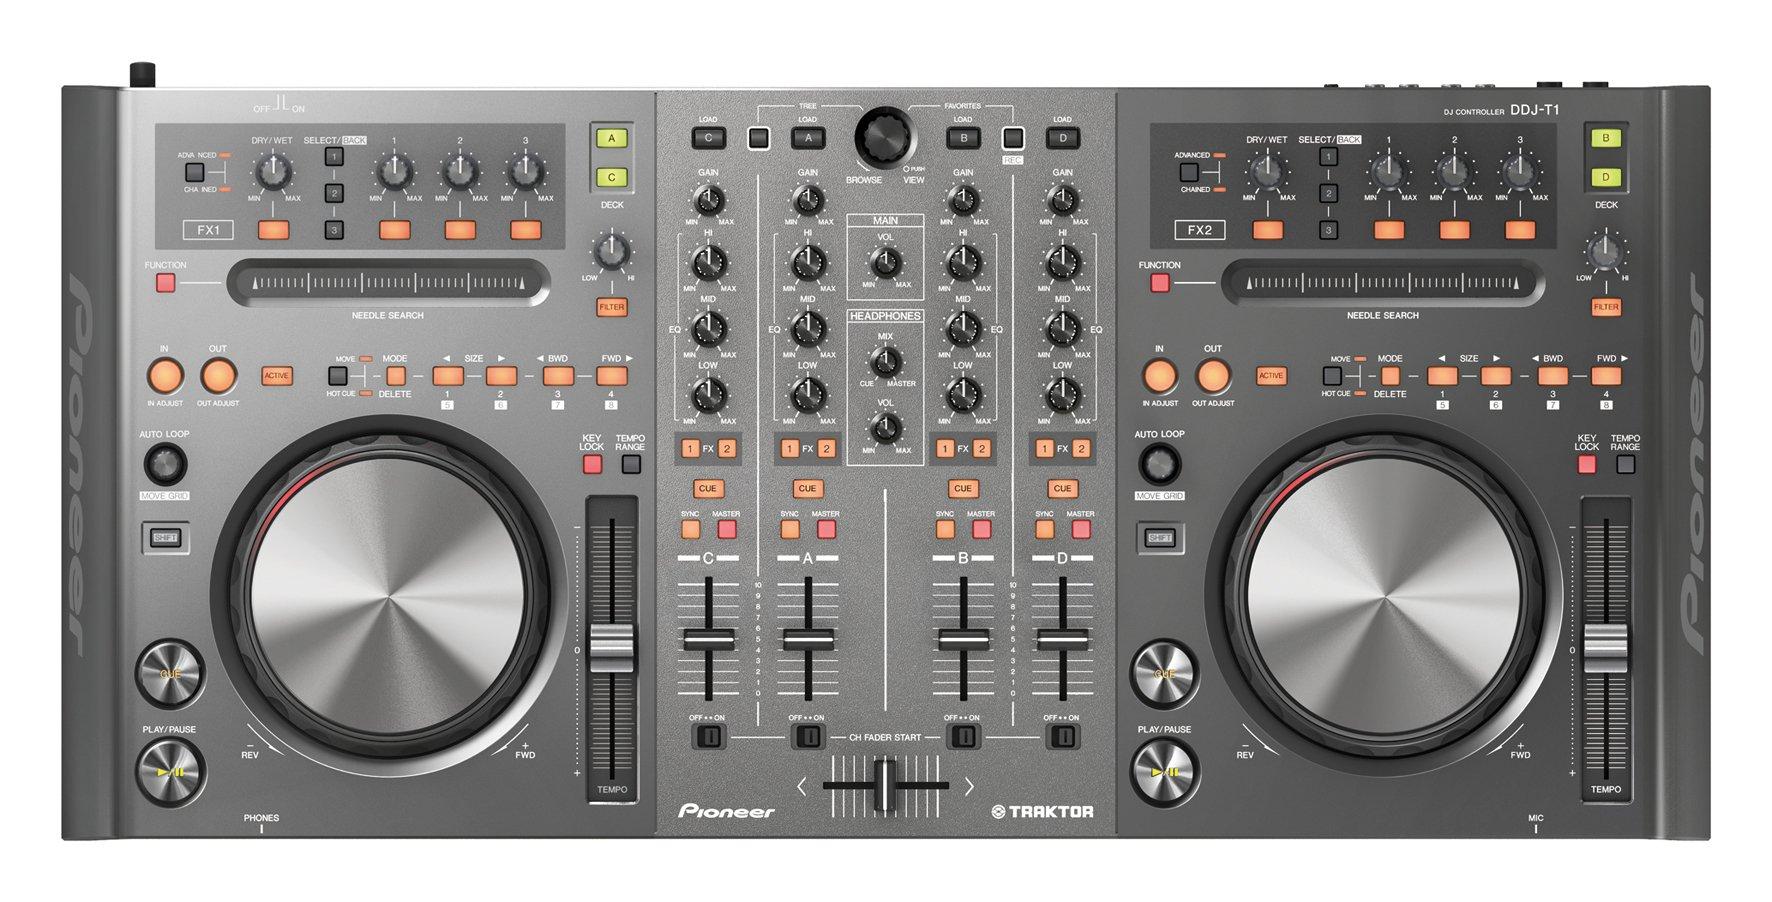 Virtual DJ Controllers: New Hardware for Serato, Traktor